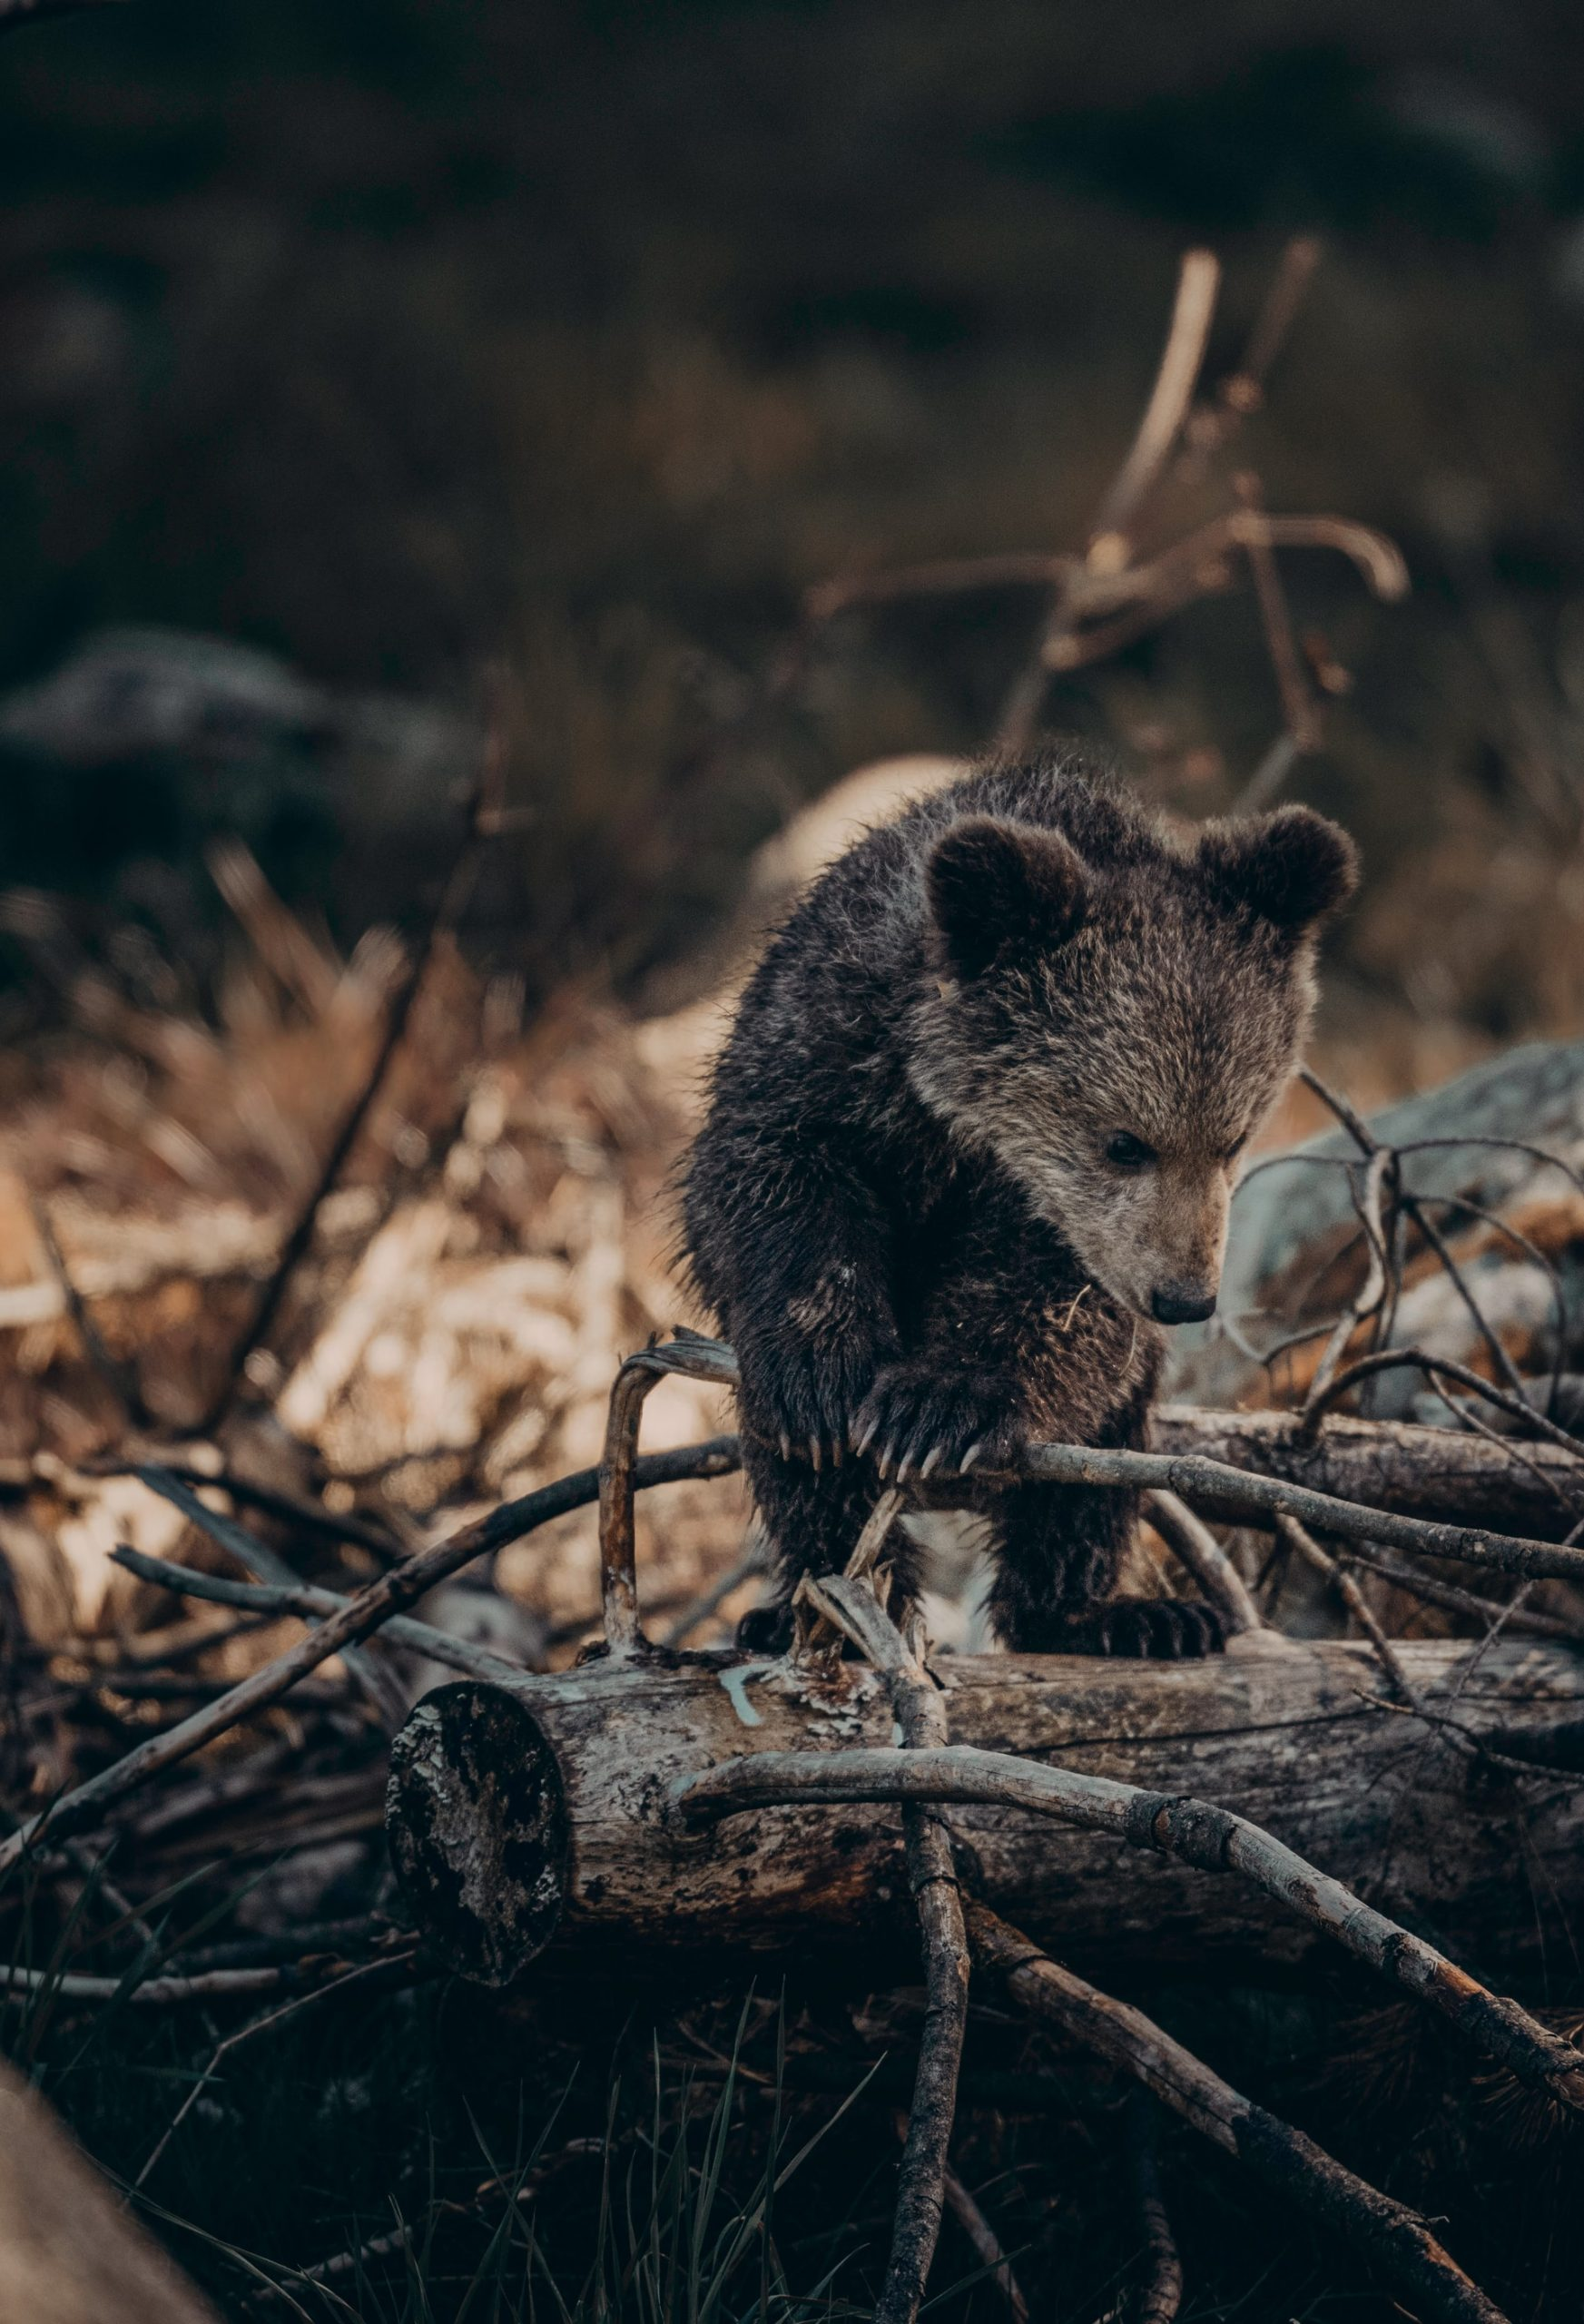 emaciated bear